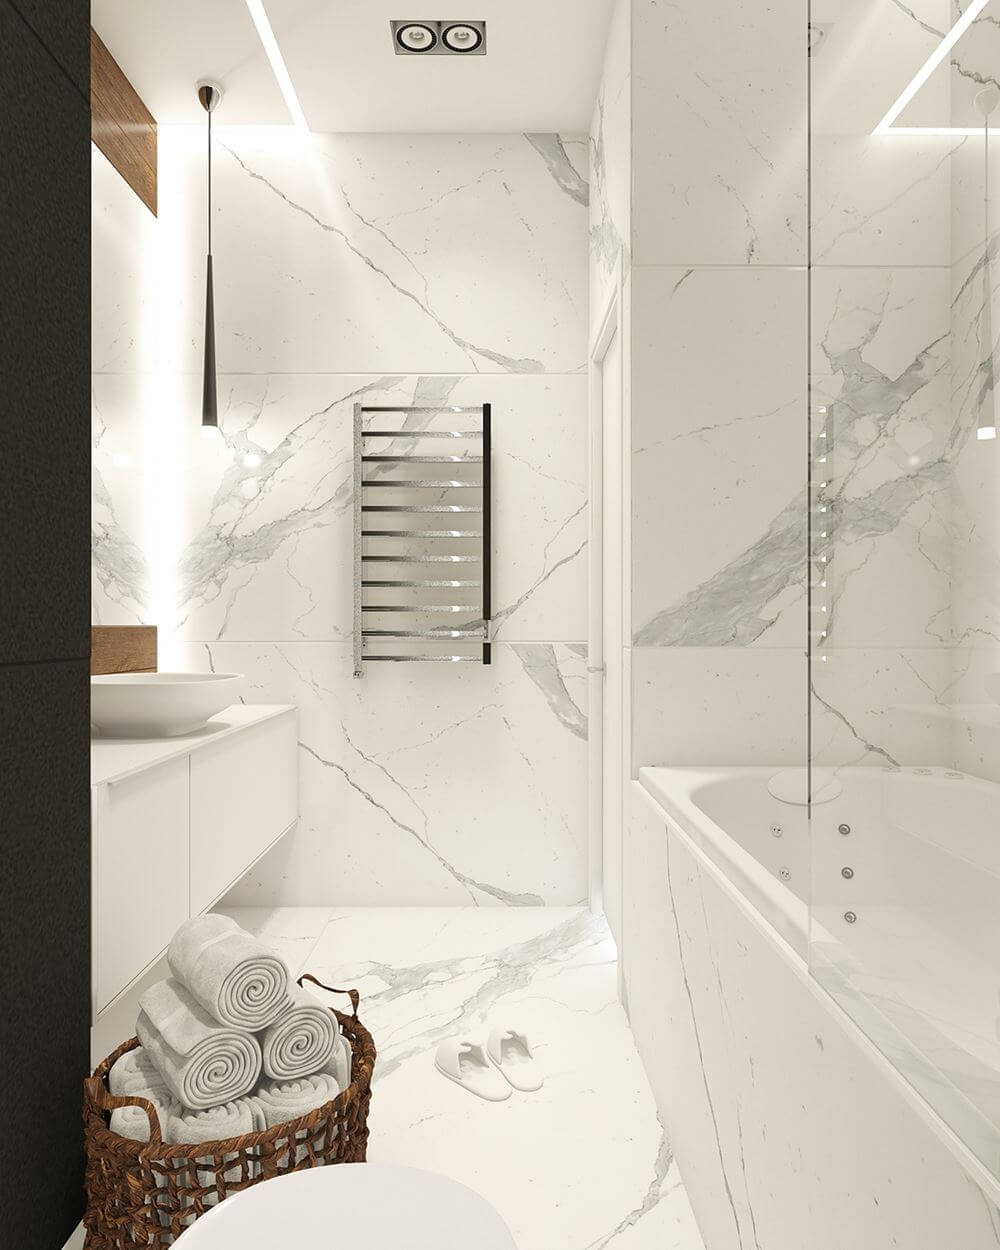 vasca da incasso rivestita in marmo